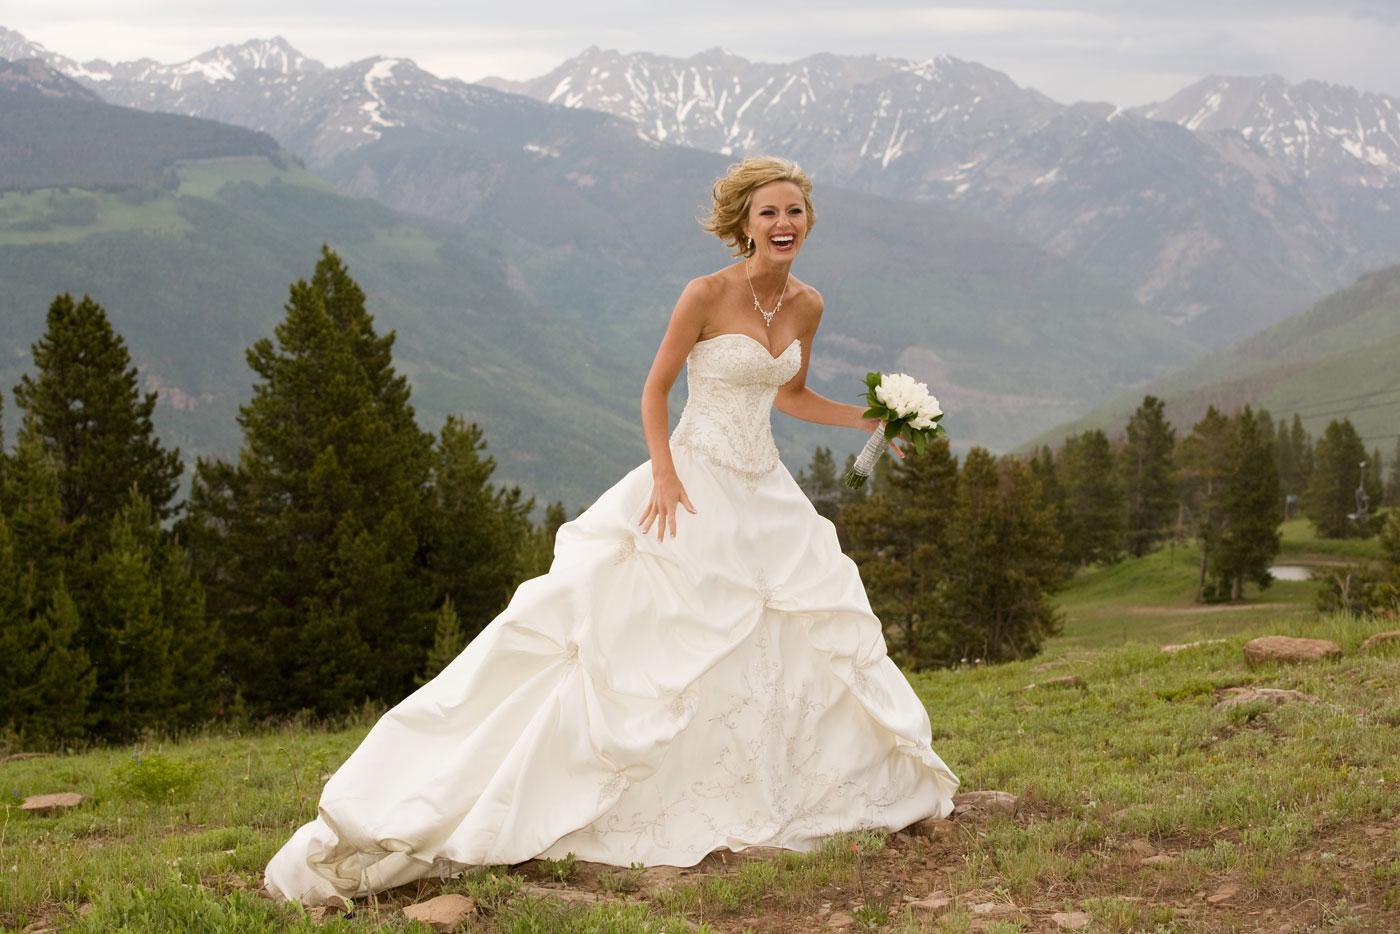 Vail_Wedding_Deck_Photography-001.jpg